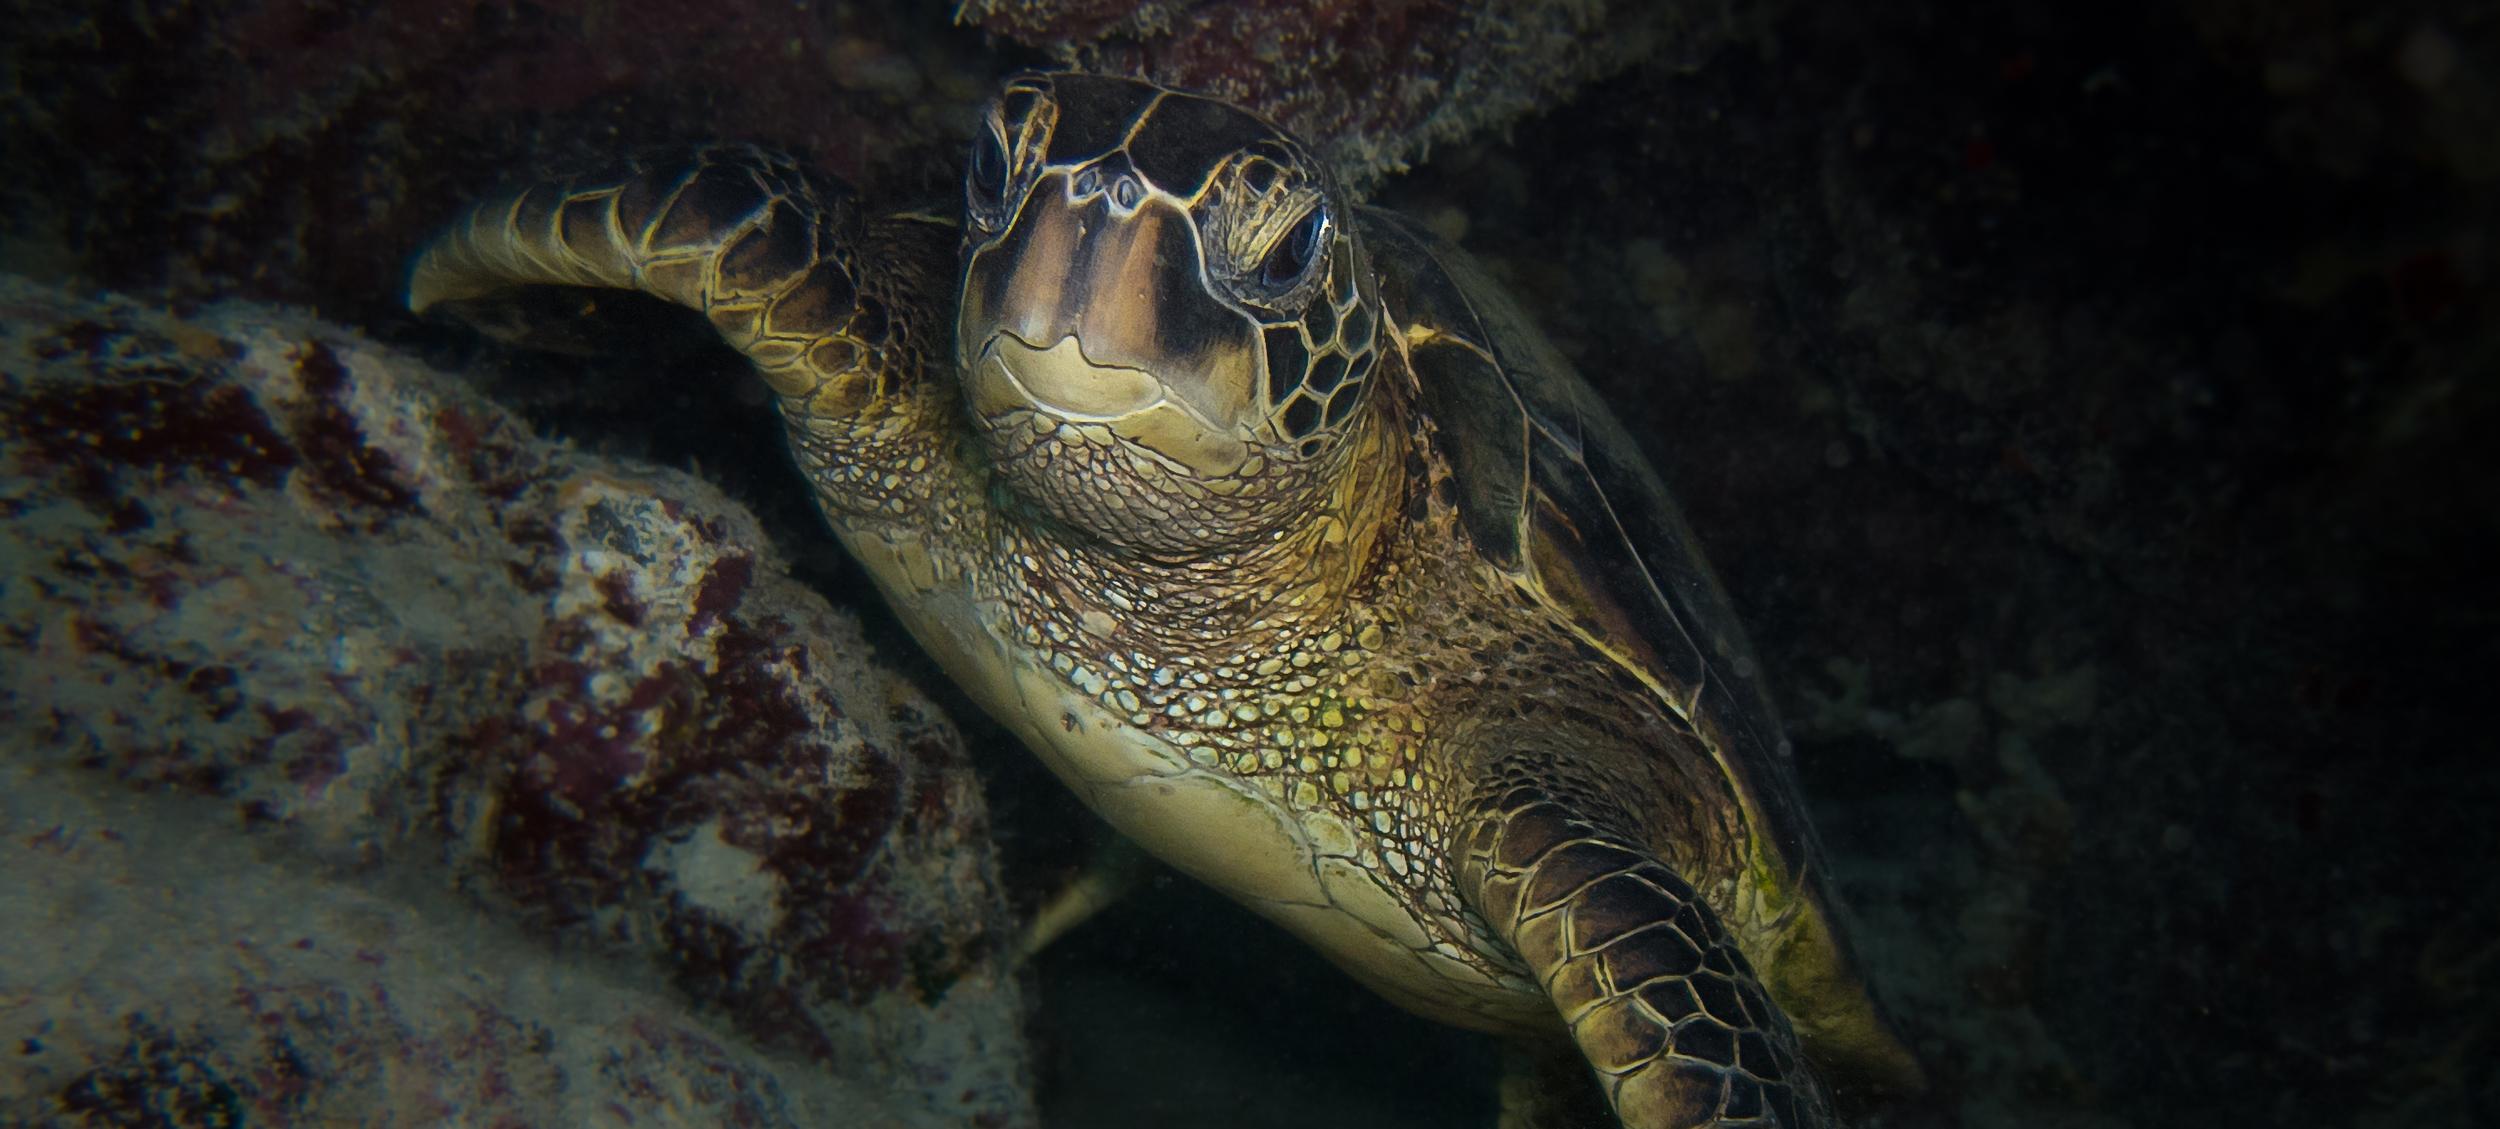 Green Sea Turtle_20131230(Crop).jpg